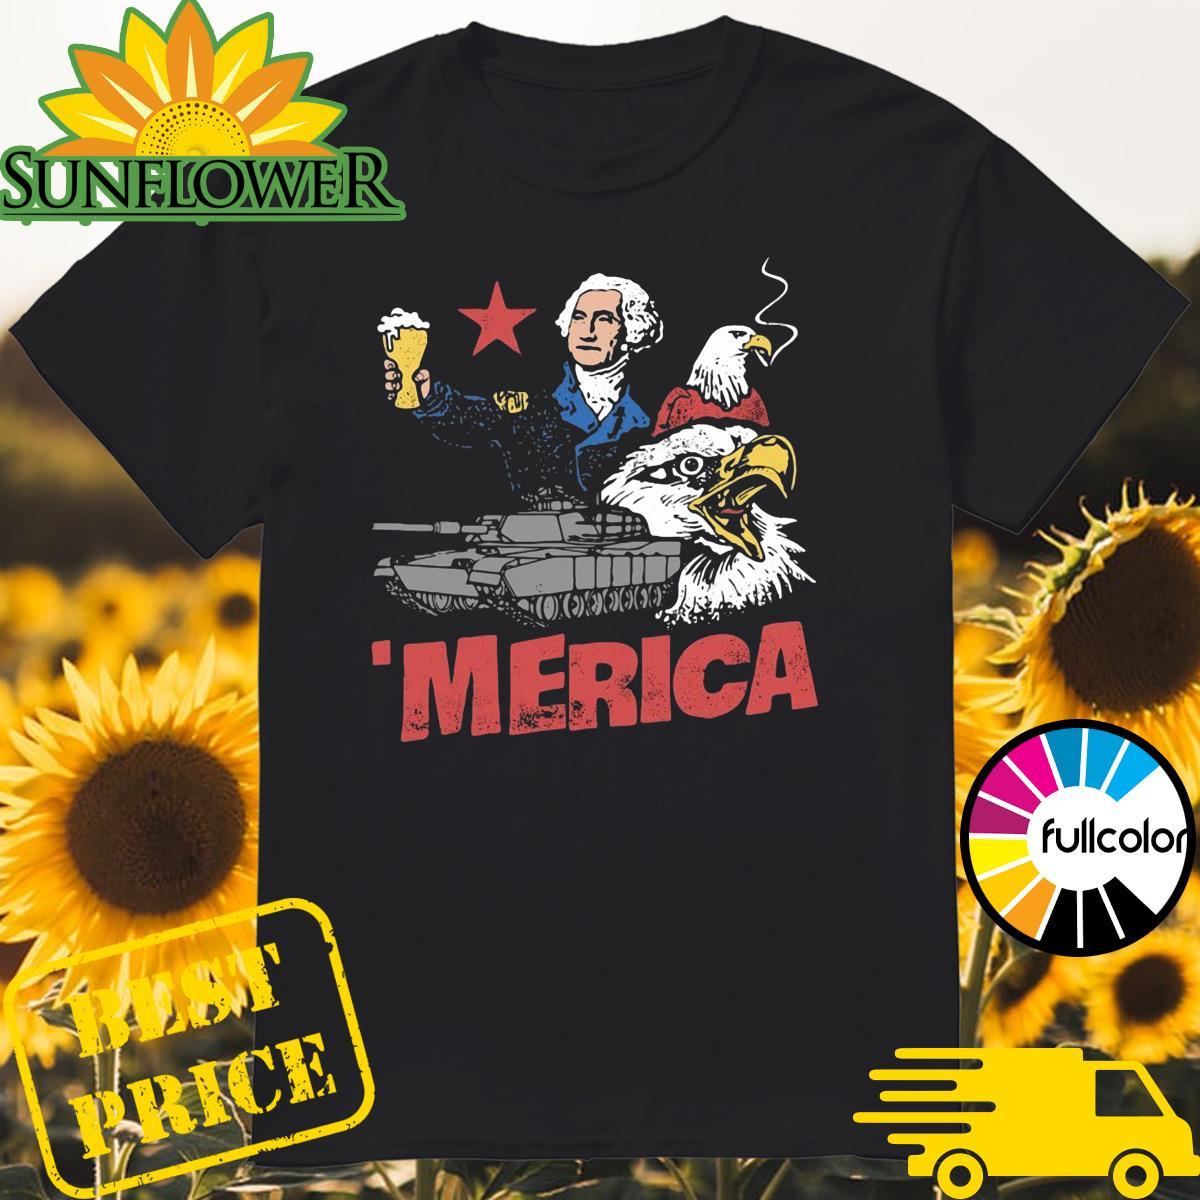 _Merica Eagle American Shirt